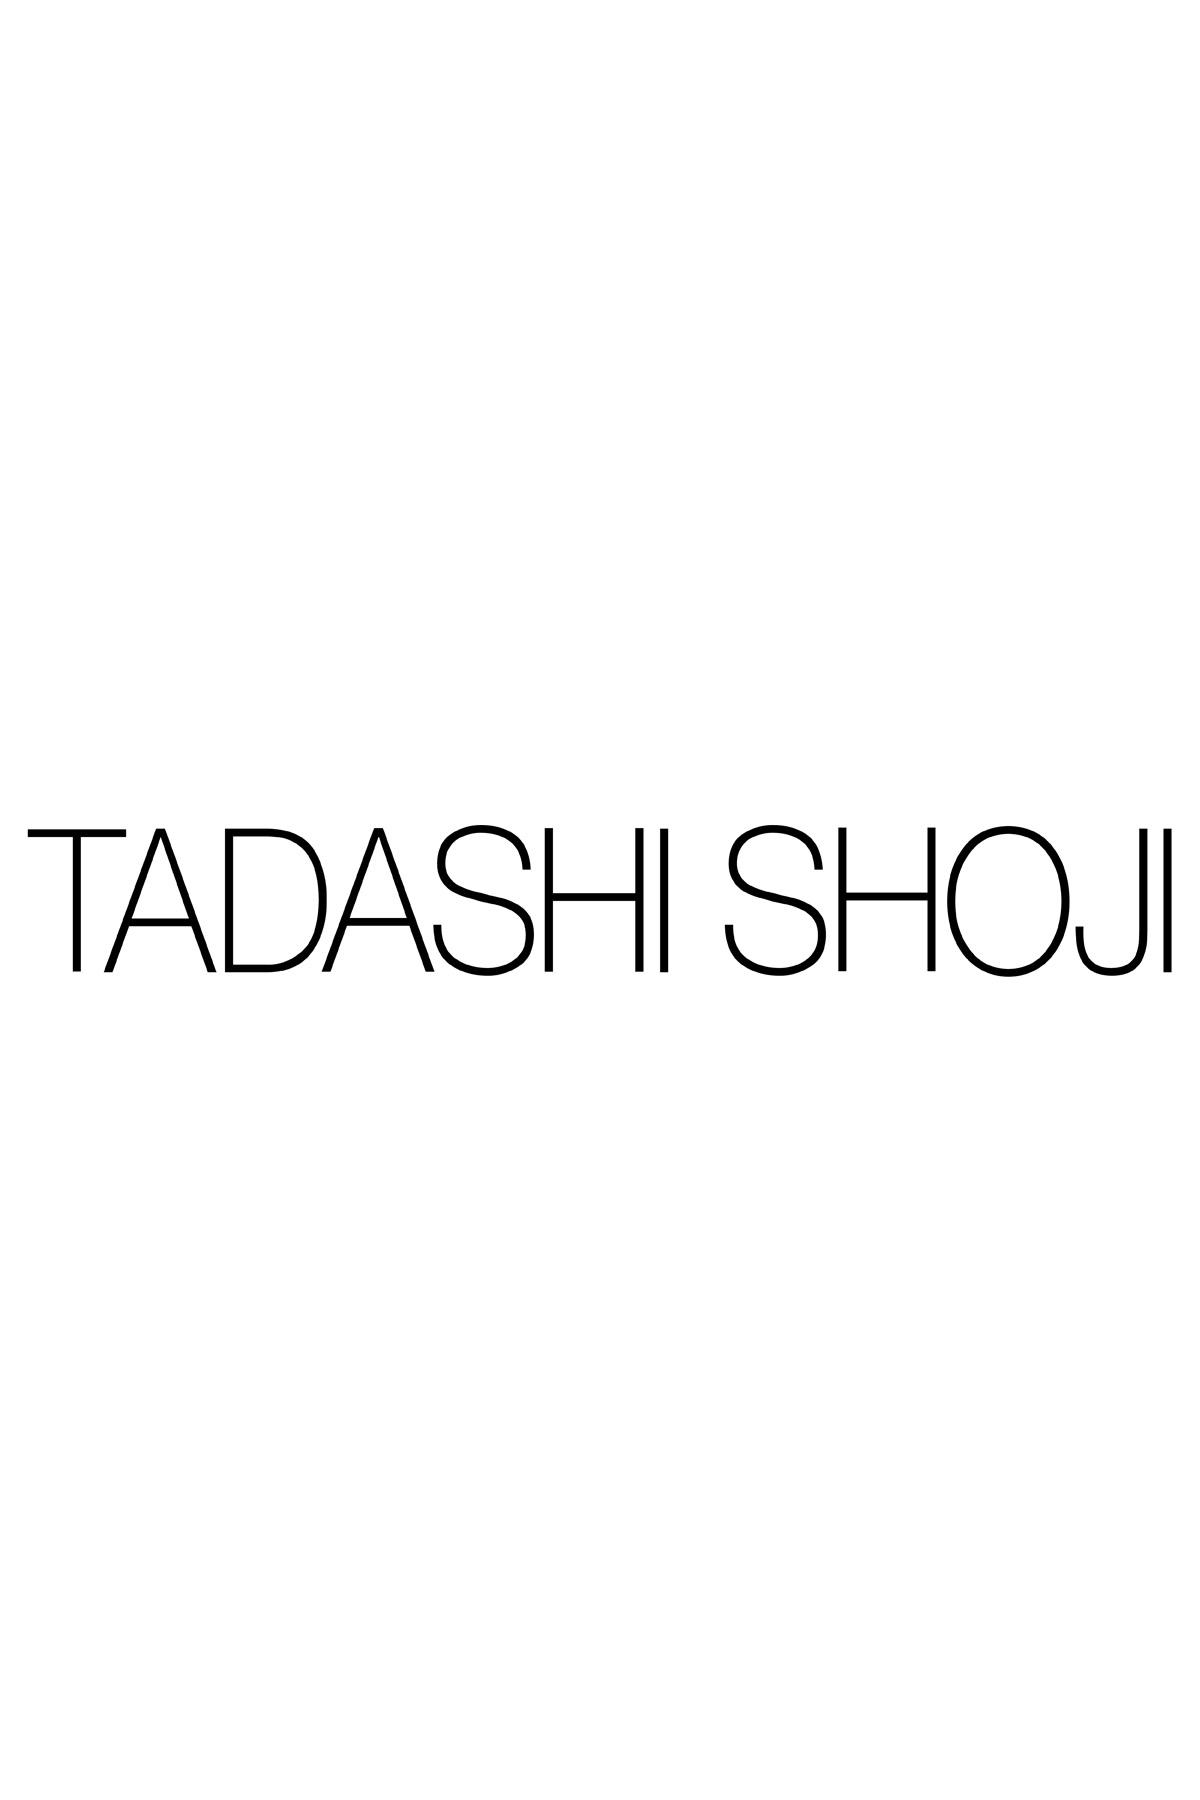 Tadashi Shoji - Yaita Dress - Detail